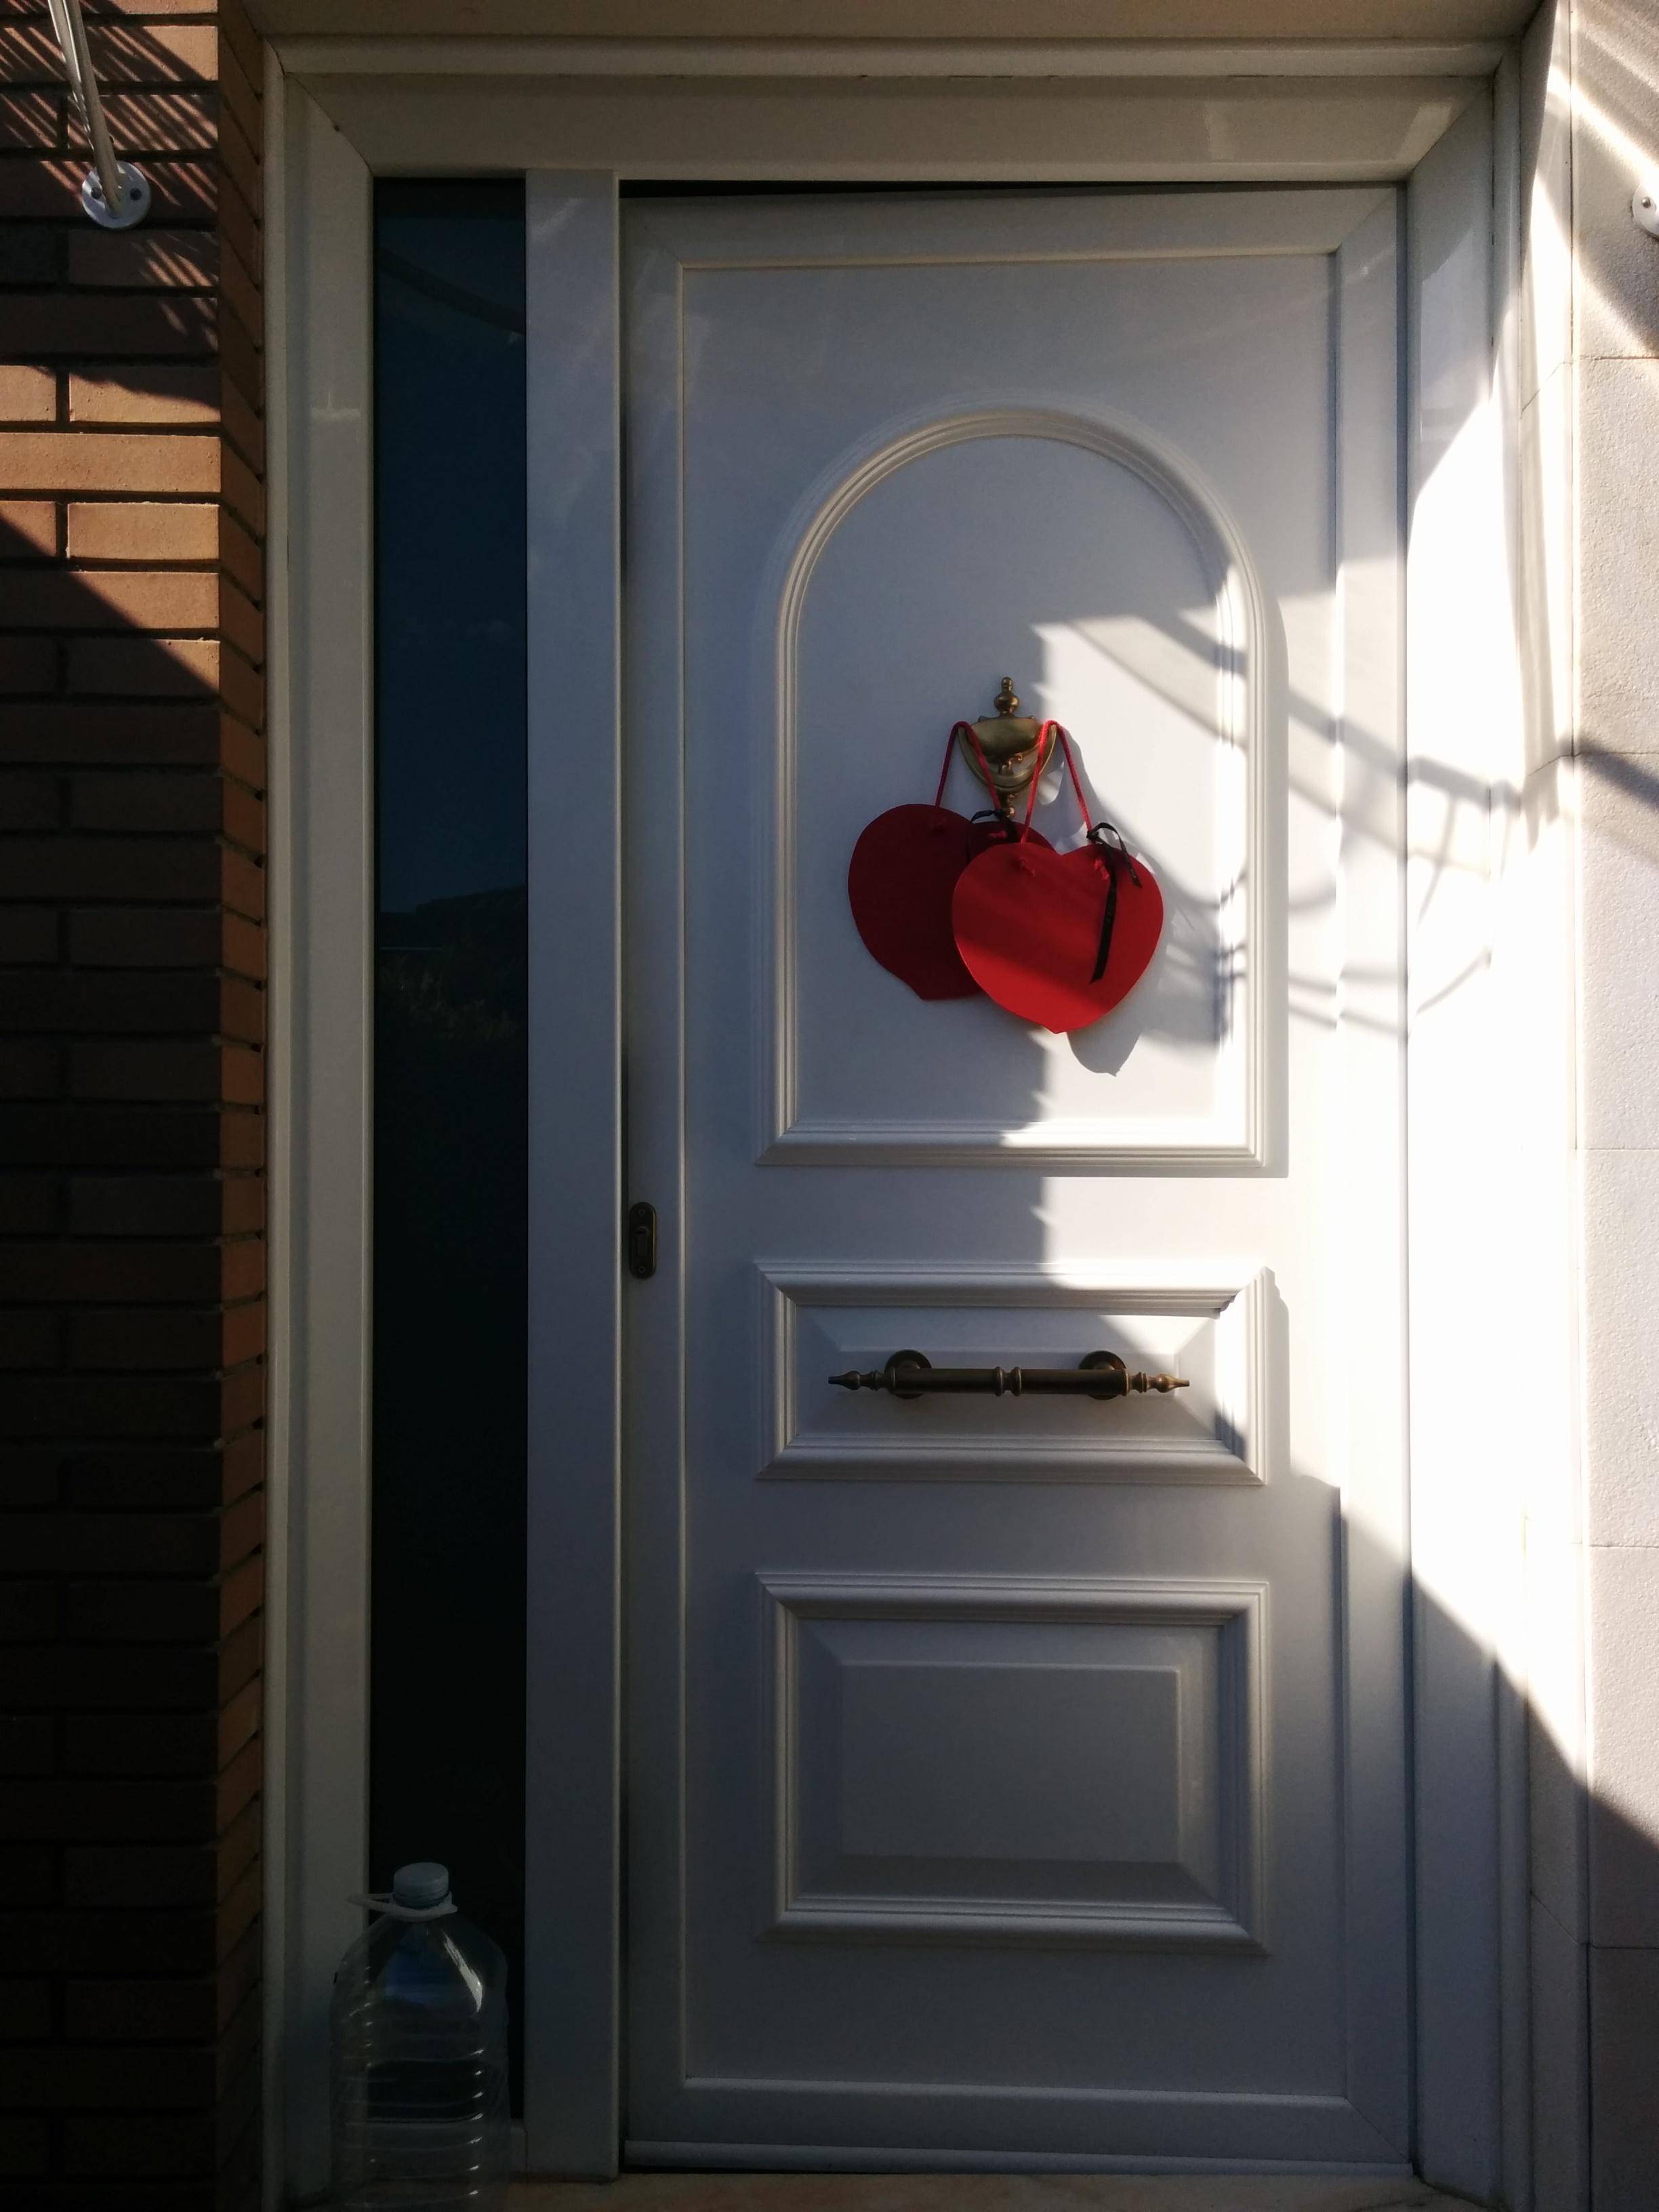 Bon Nadal, Feliz Navidad, Zorionak eta Urte Berri On,  Bo Nadal, Merry Christmas, Bon Natale, Joieux Noël, frohe Weihnachten, счастливого Рождества, 聖誕節快樂